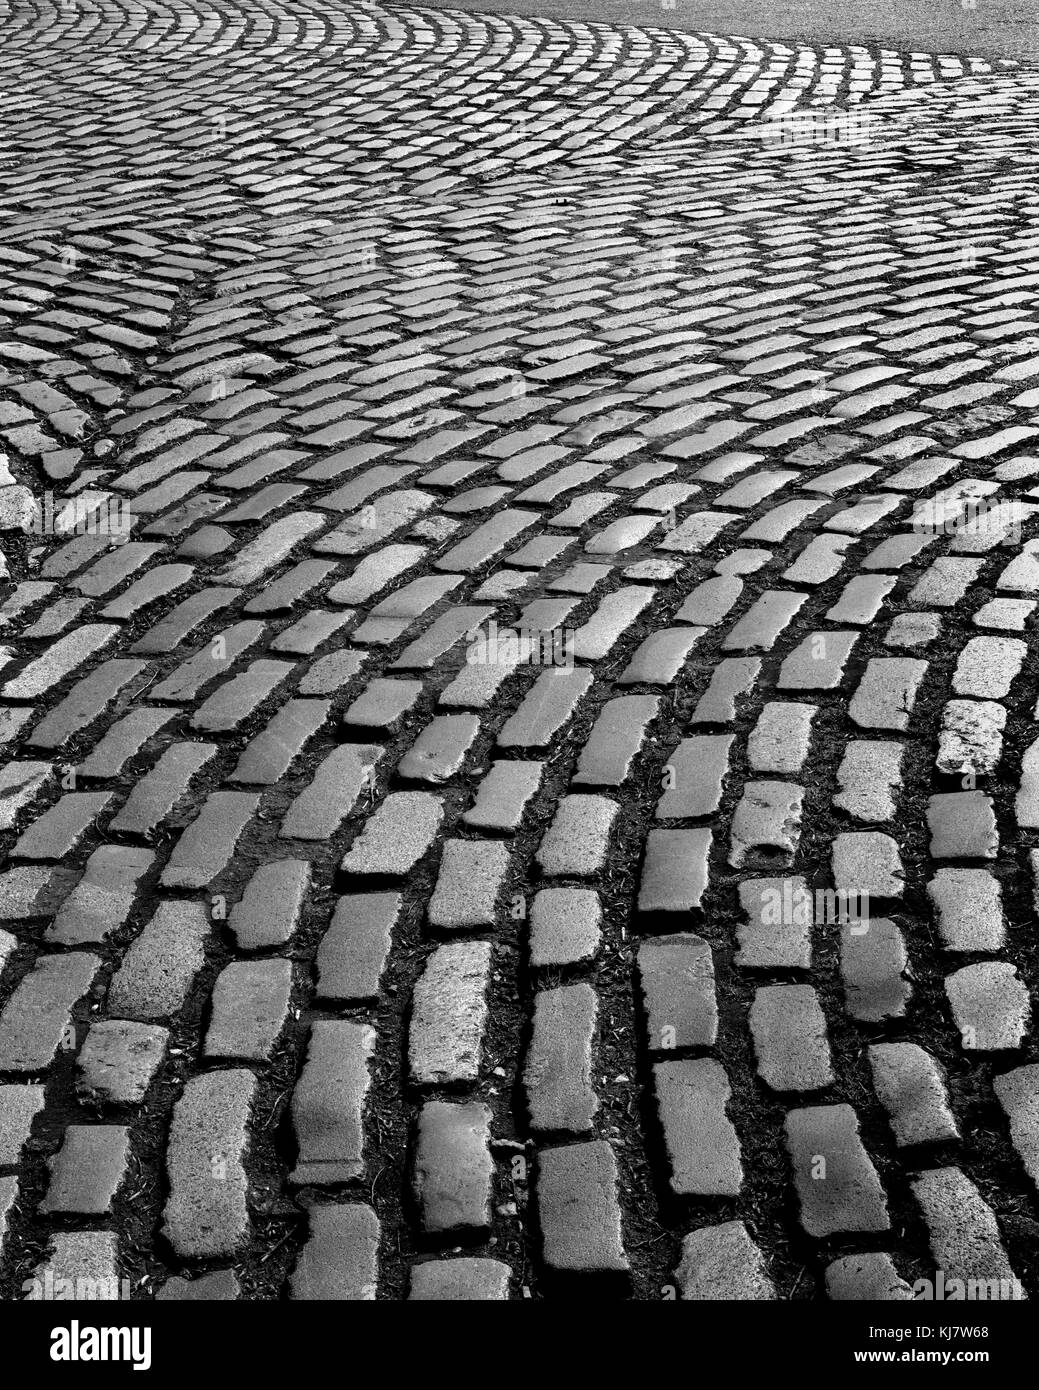 Cobblestones at the Cambridge University Sidgwick Site - Stock Image